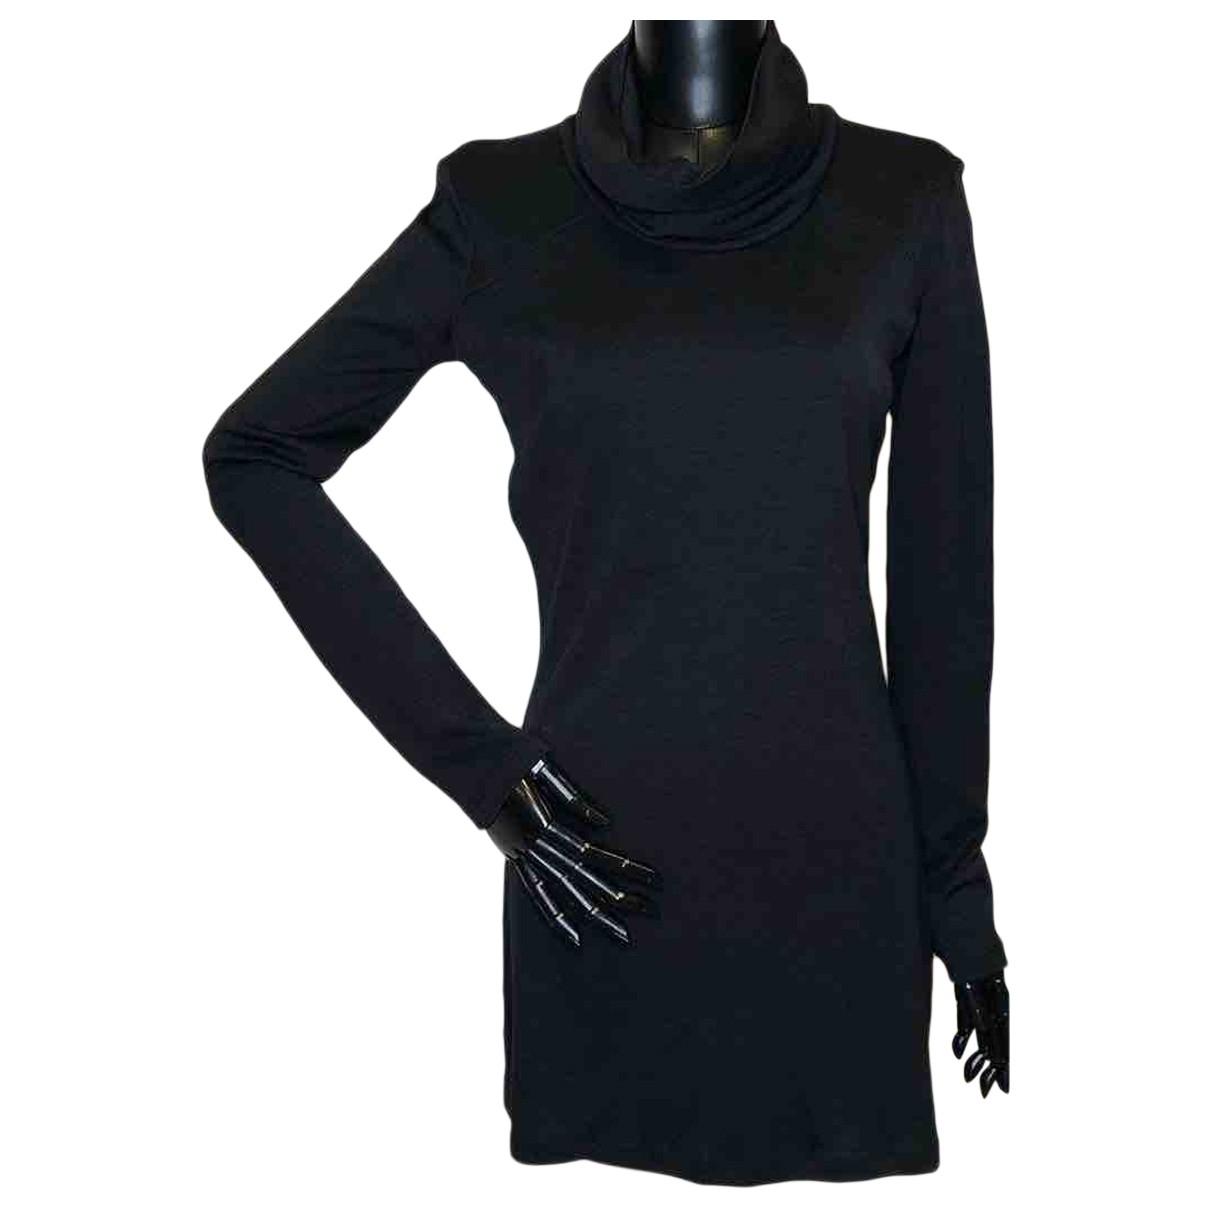 Maison Martin Margiela \N Grey Wool dress for Women S International